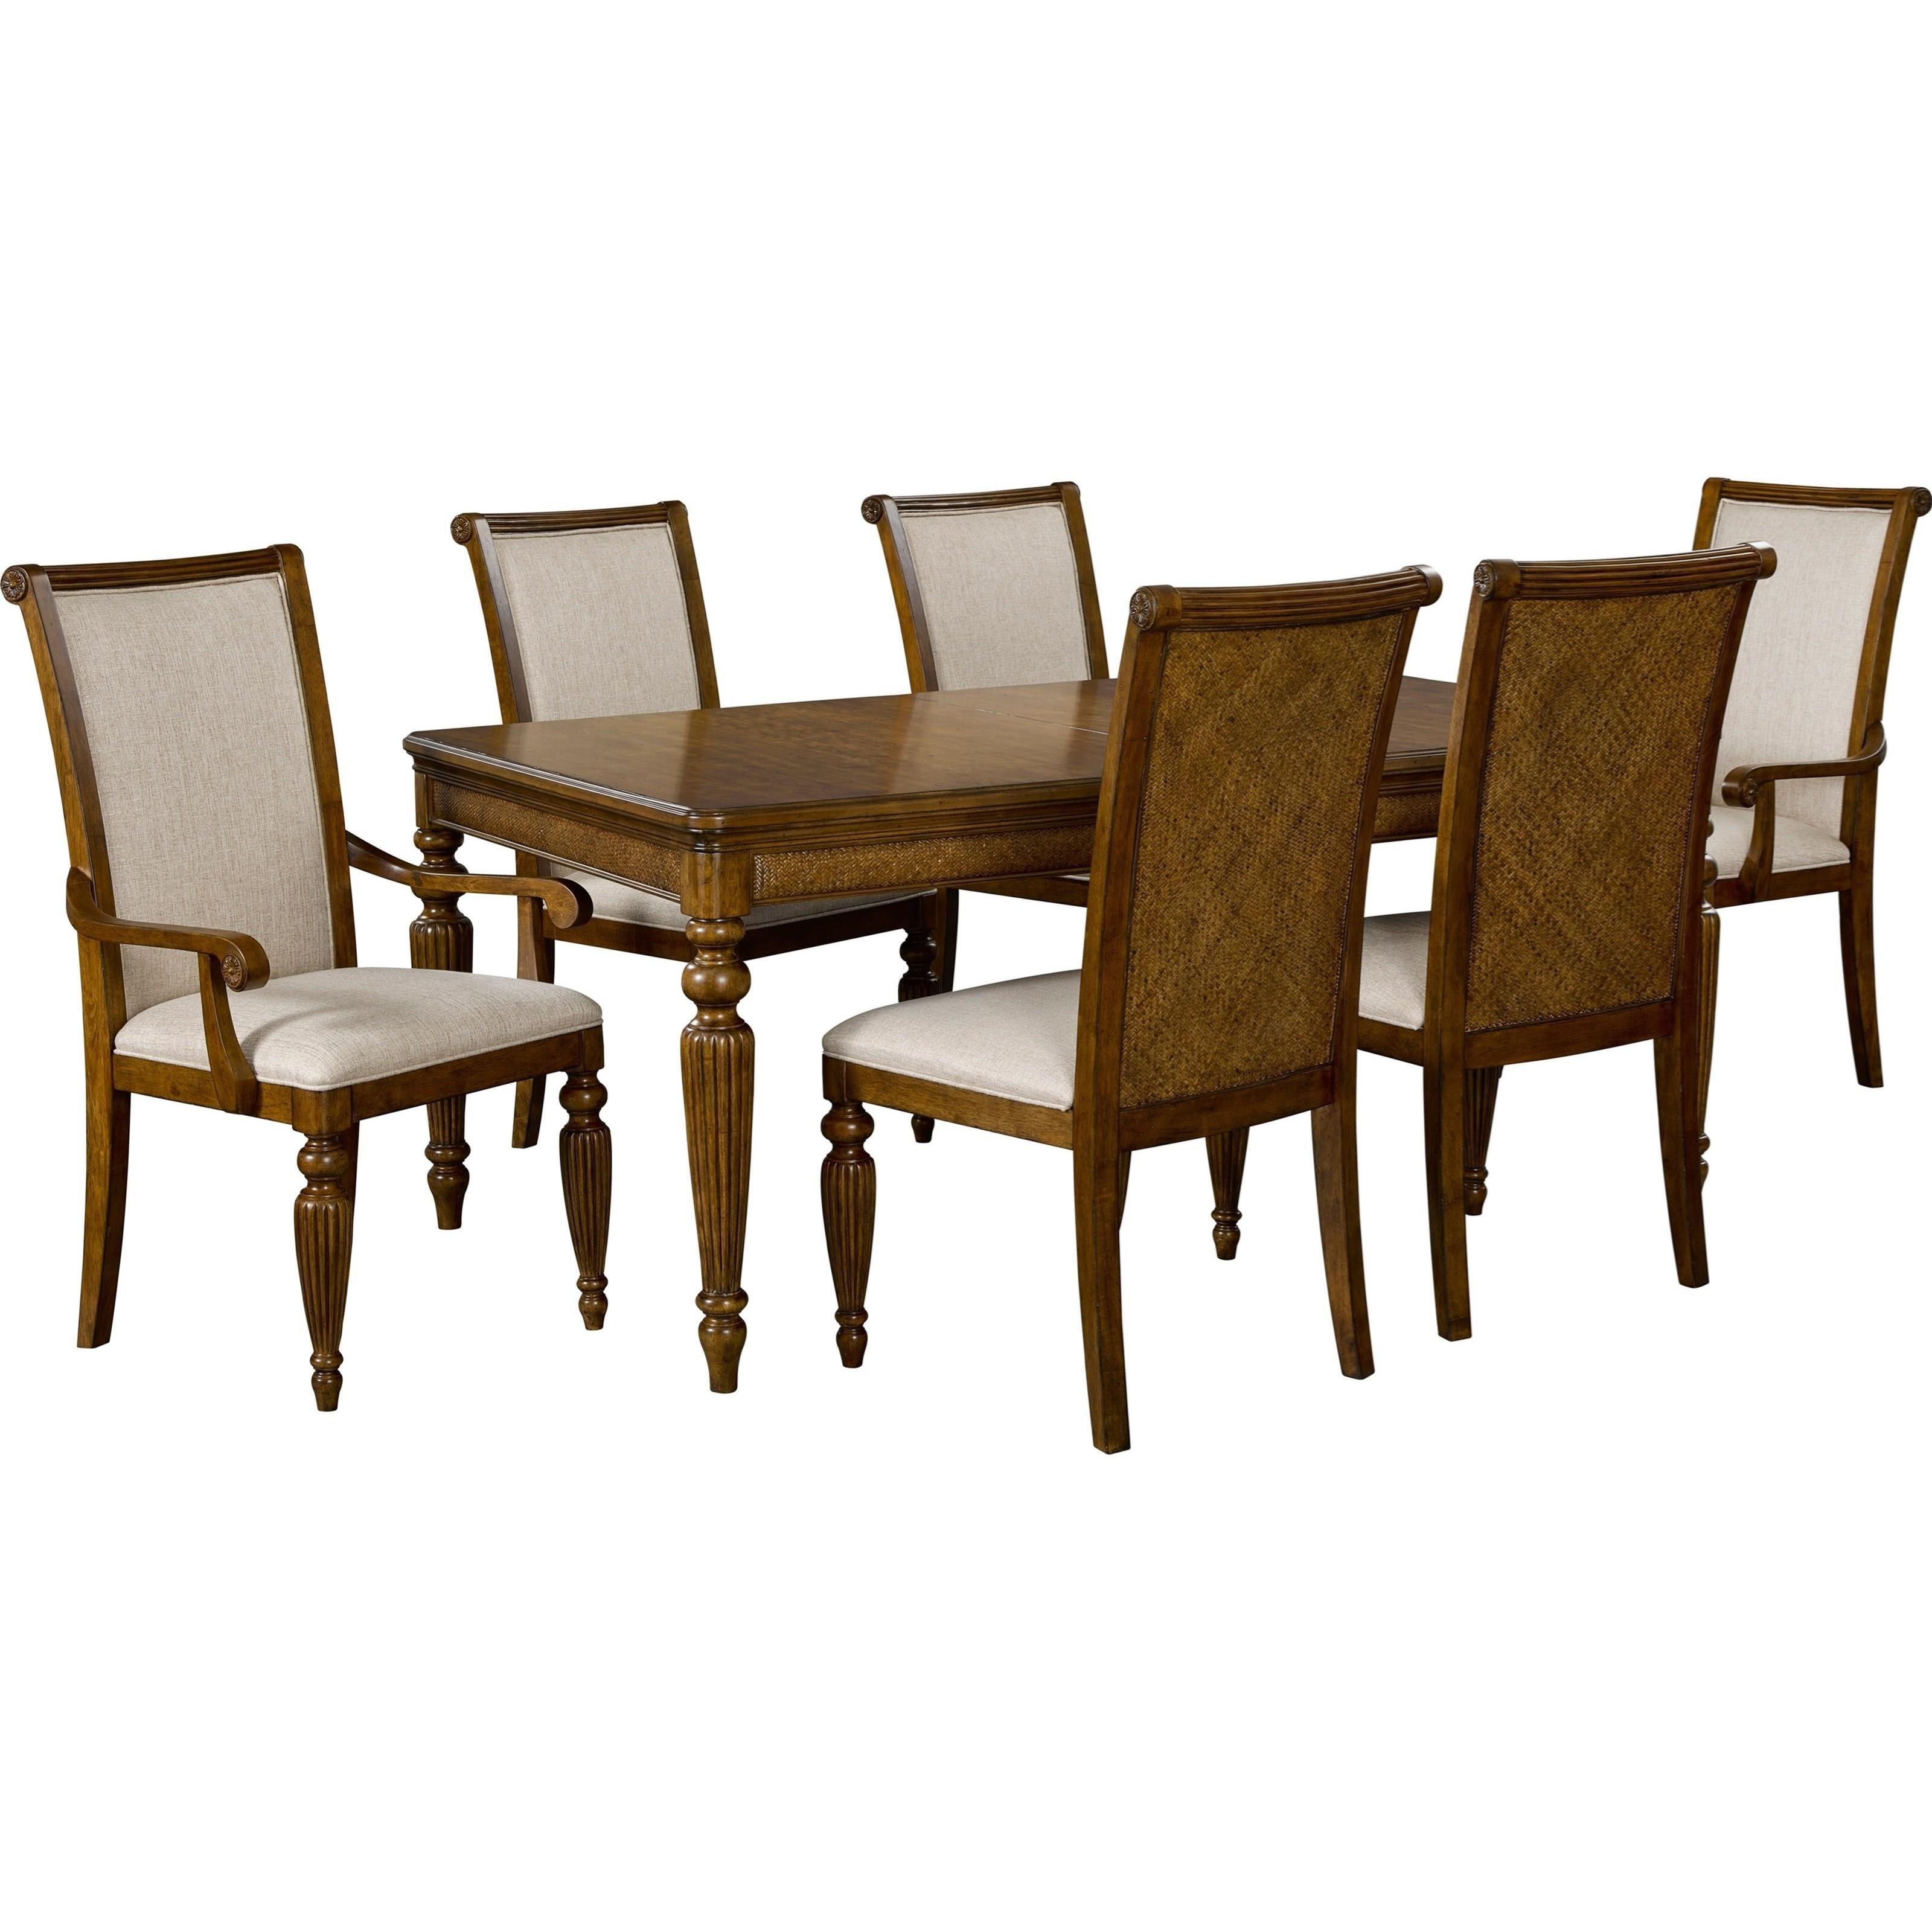 ... Broyhill Furniture Amalie BayLeg Dining Table